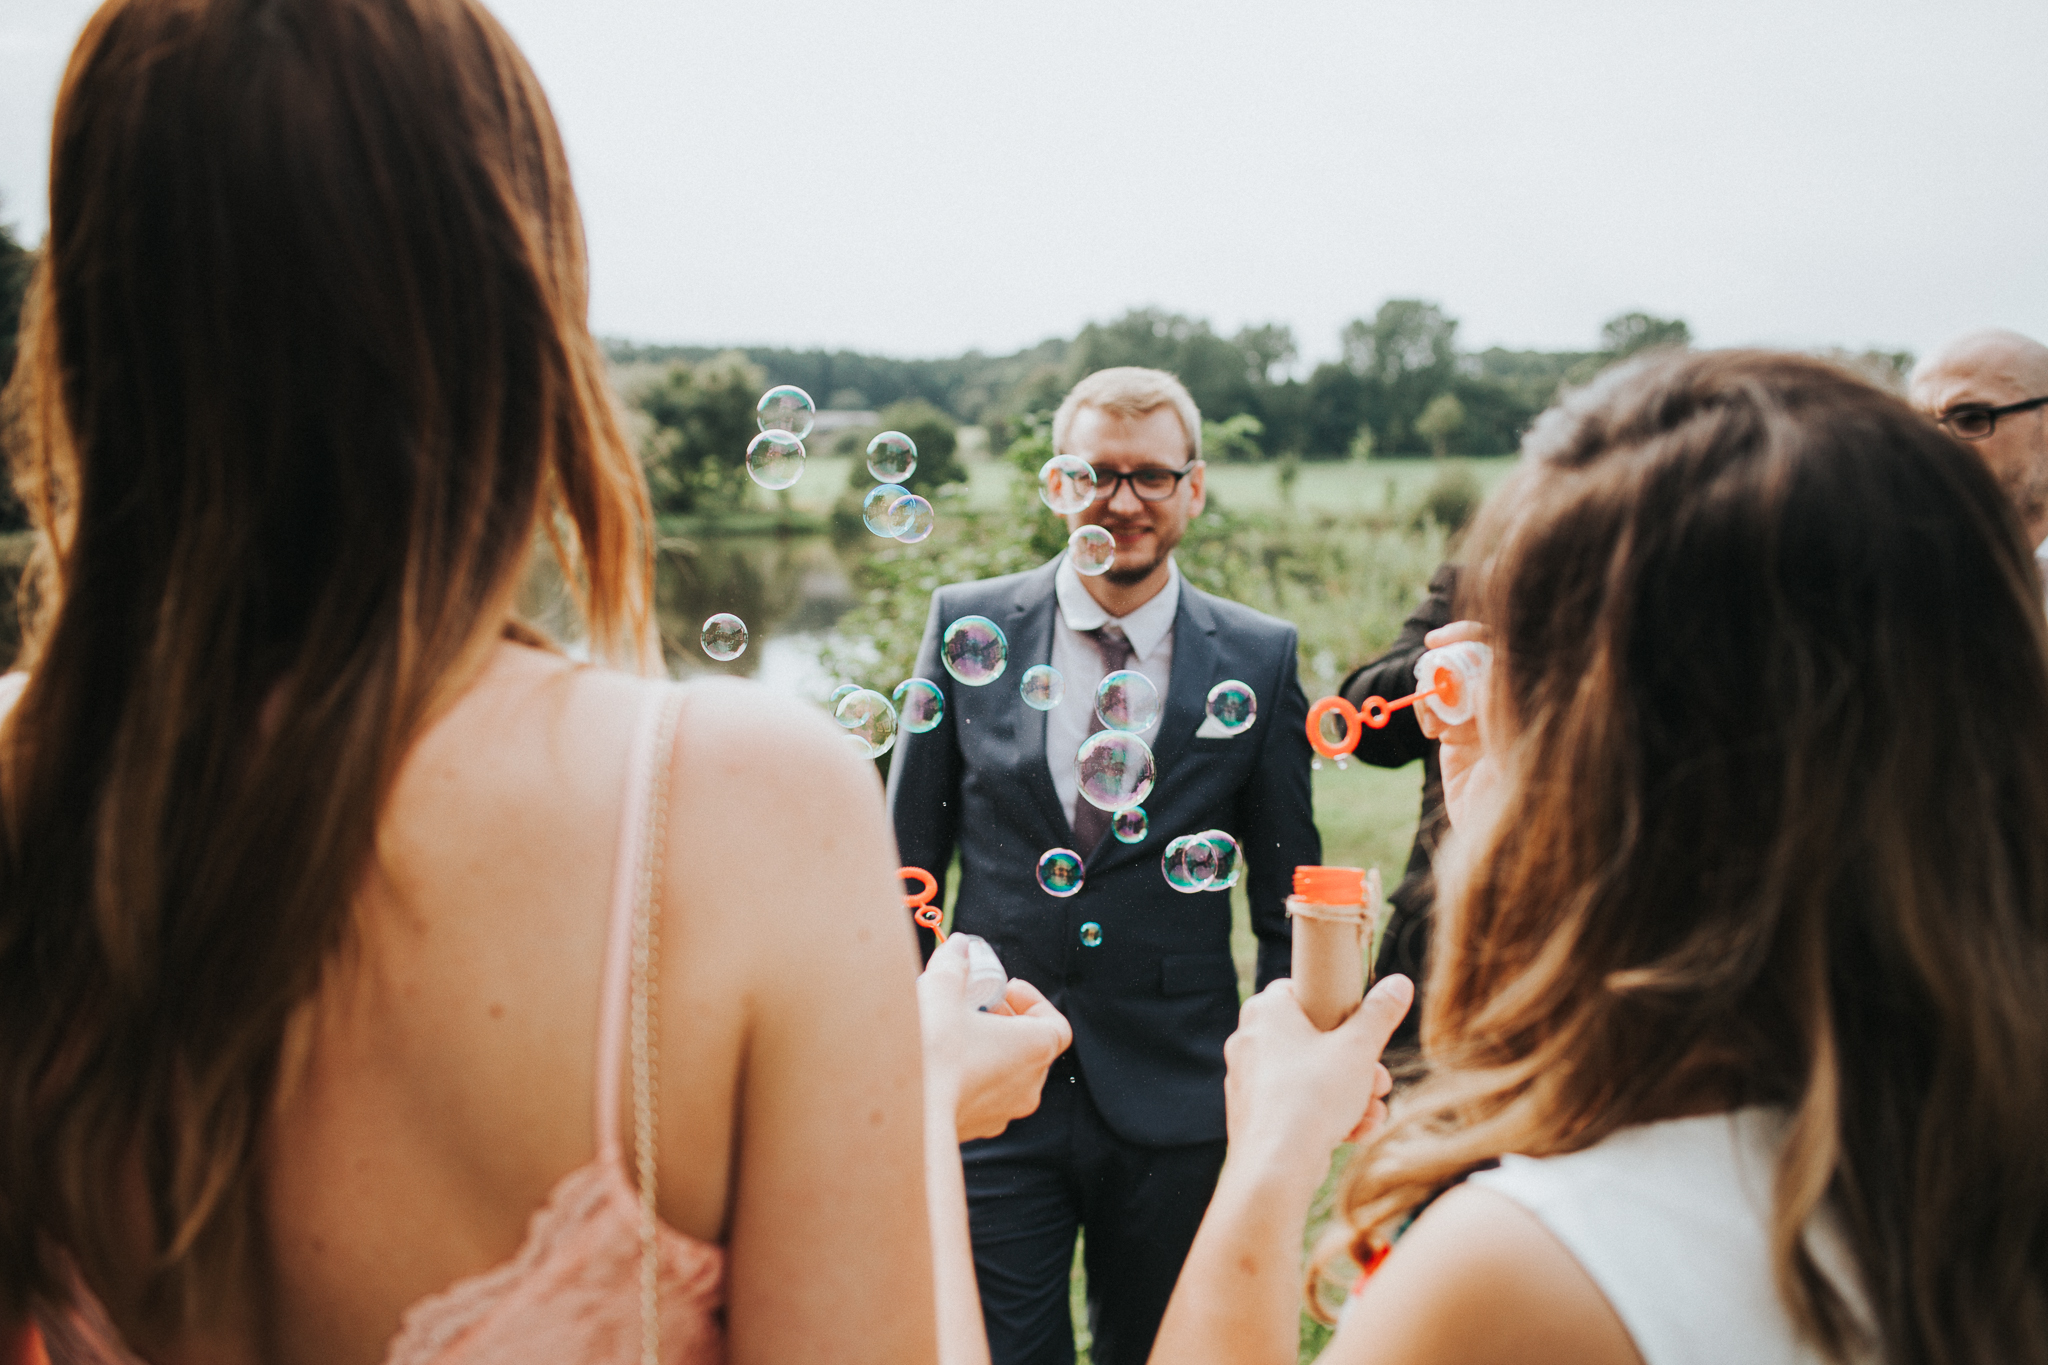 Hochzeitsfotograf-Seck-25.jpg